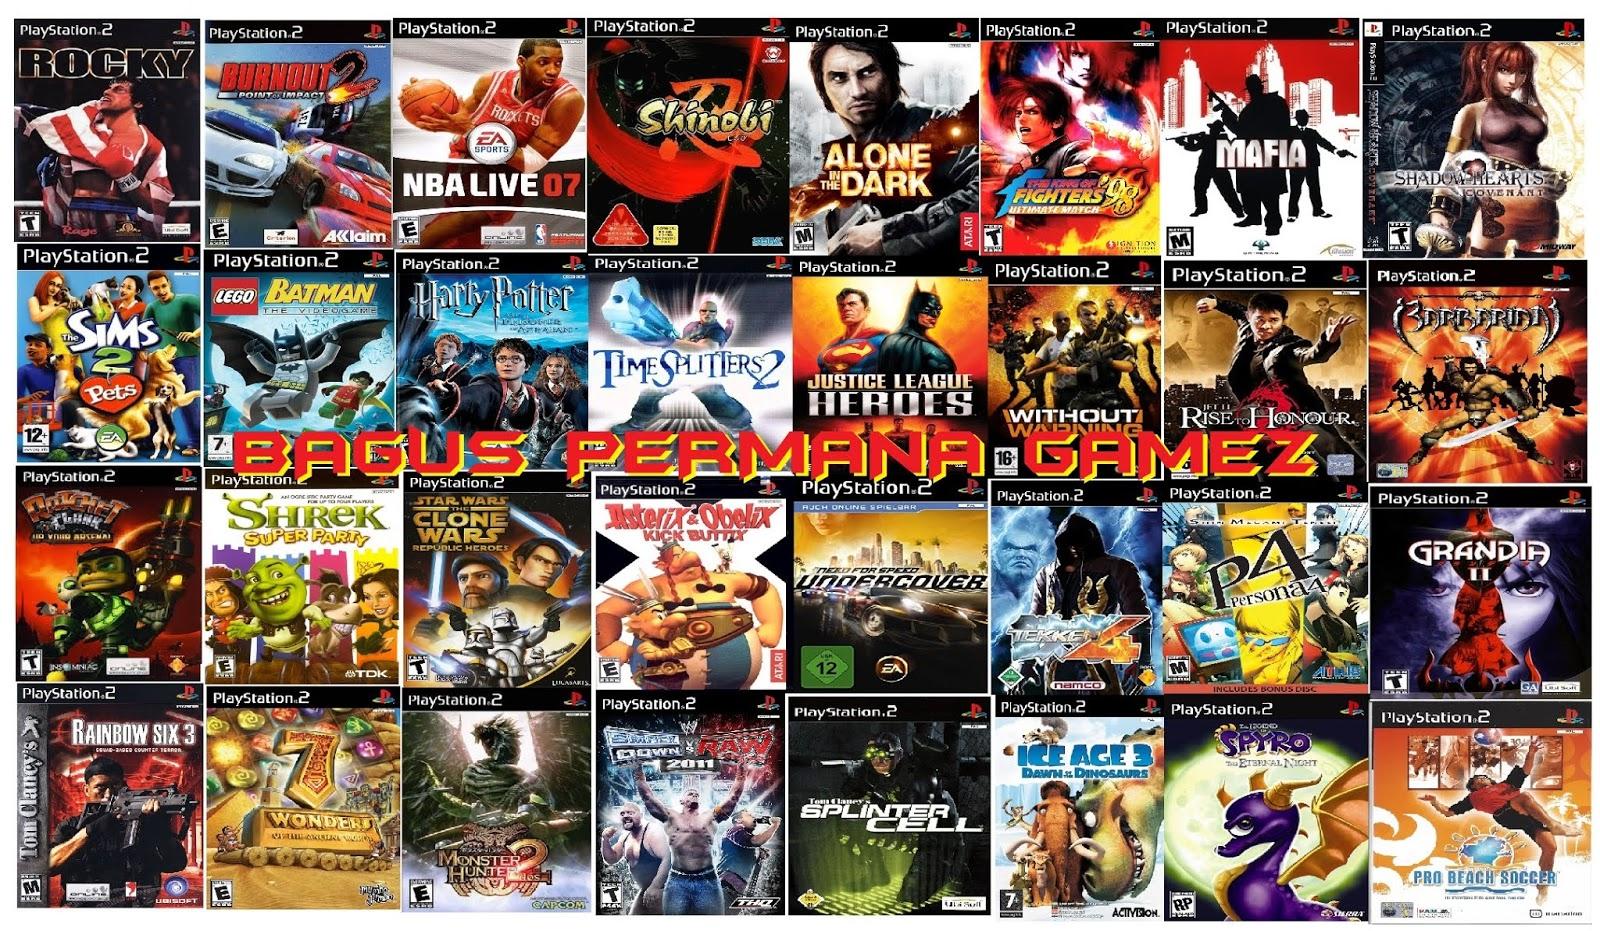 Jasa Isi Game Ps2pspps3ps4 Hen 505 Kaset Bd Ps4 Dirt Rally Reg 2 Zathura 29gb Bpg U 22gb Zoids Infinity Fuzors 15gb Zorro 13gb Zuma 23gb